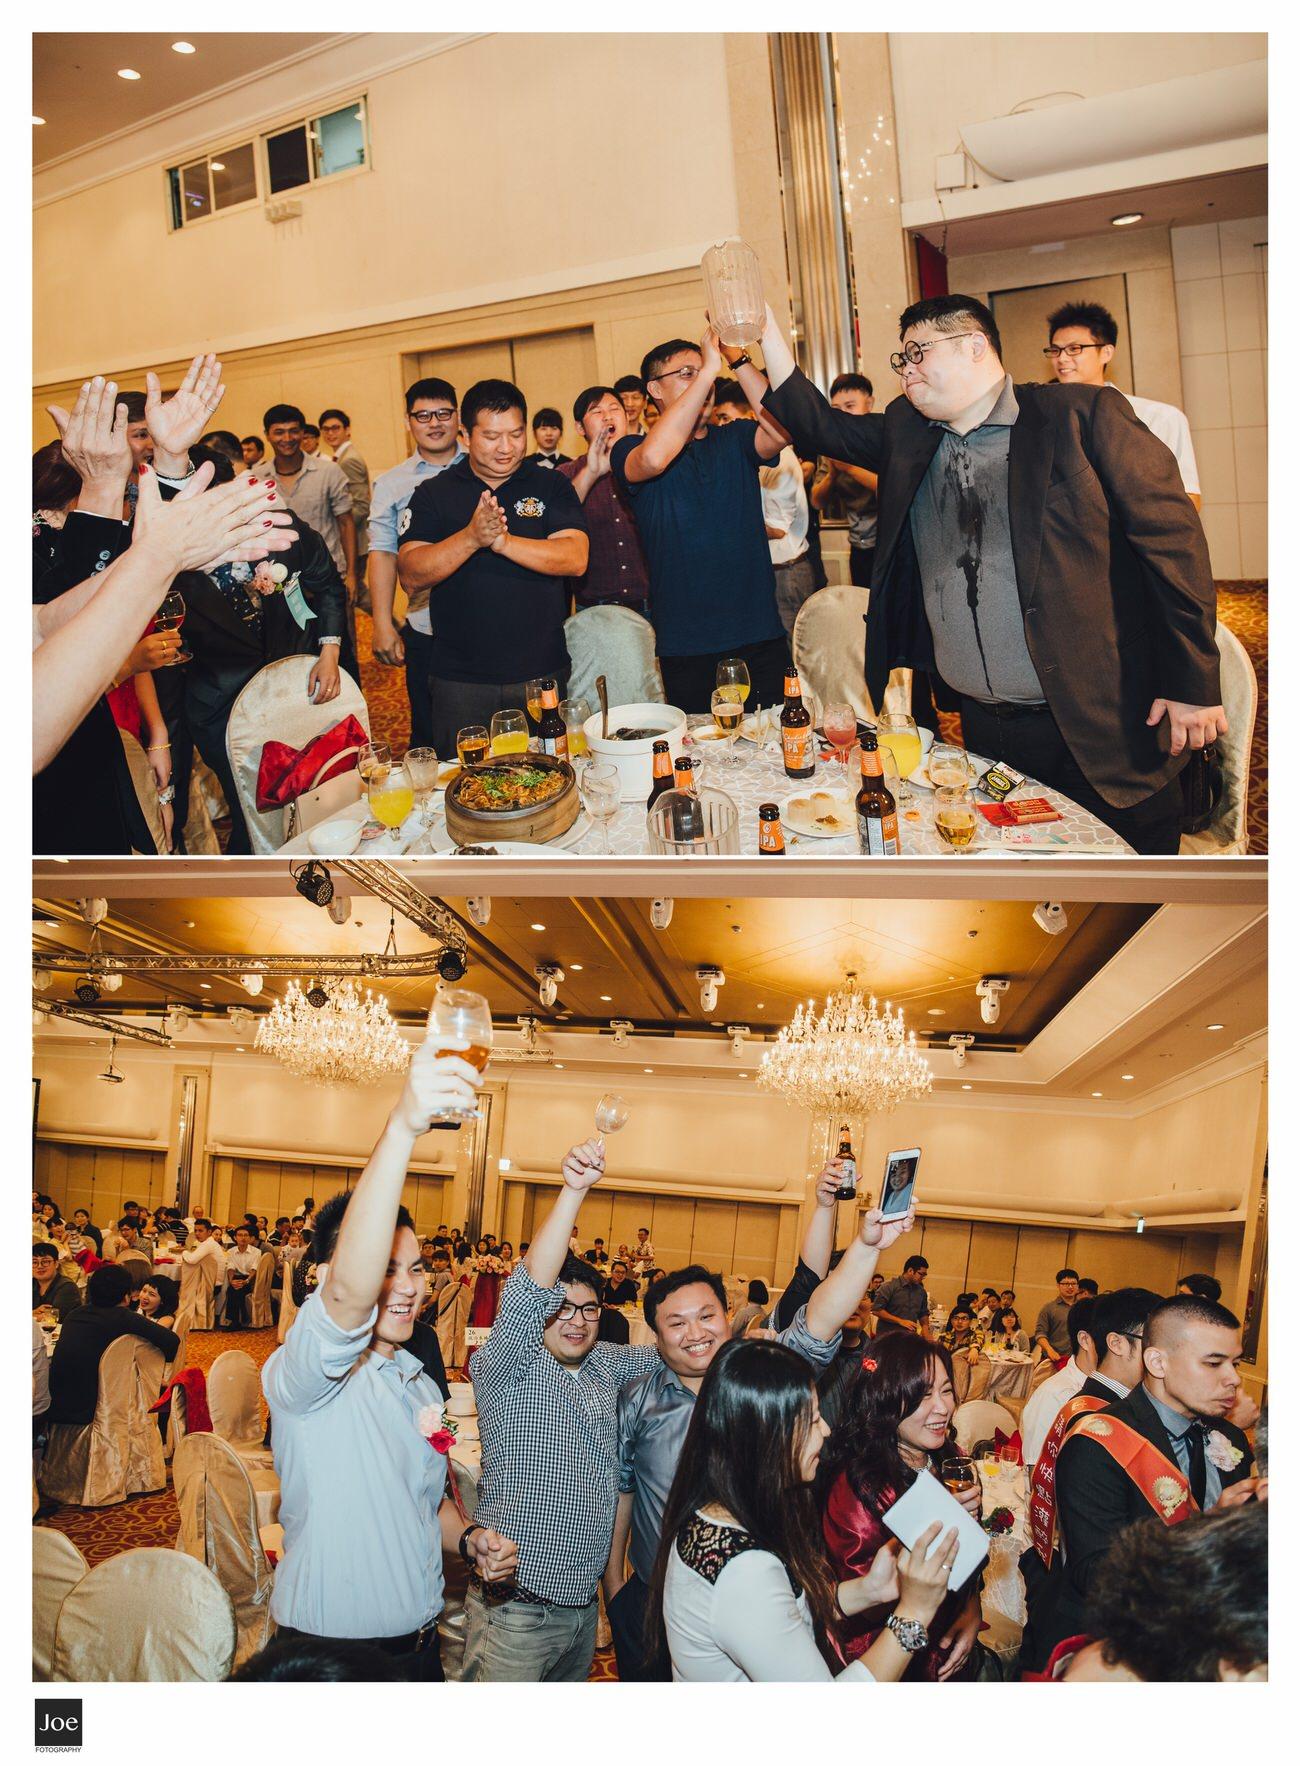 sunworld-dynasty-hotel-taipei-wedding-photo-joe-fotography-angel-jay-115.jpg